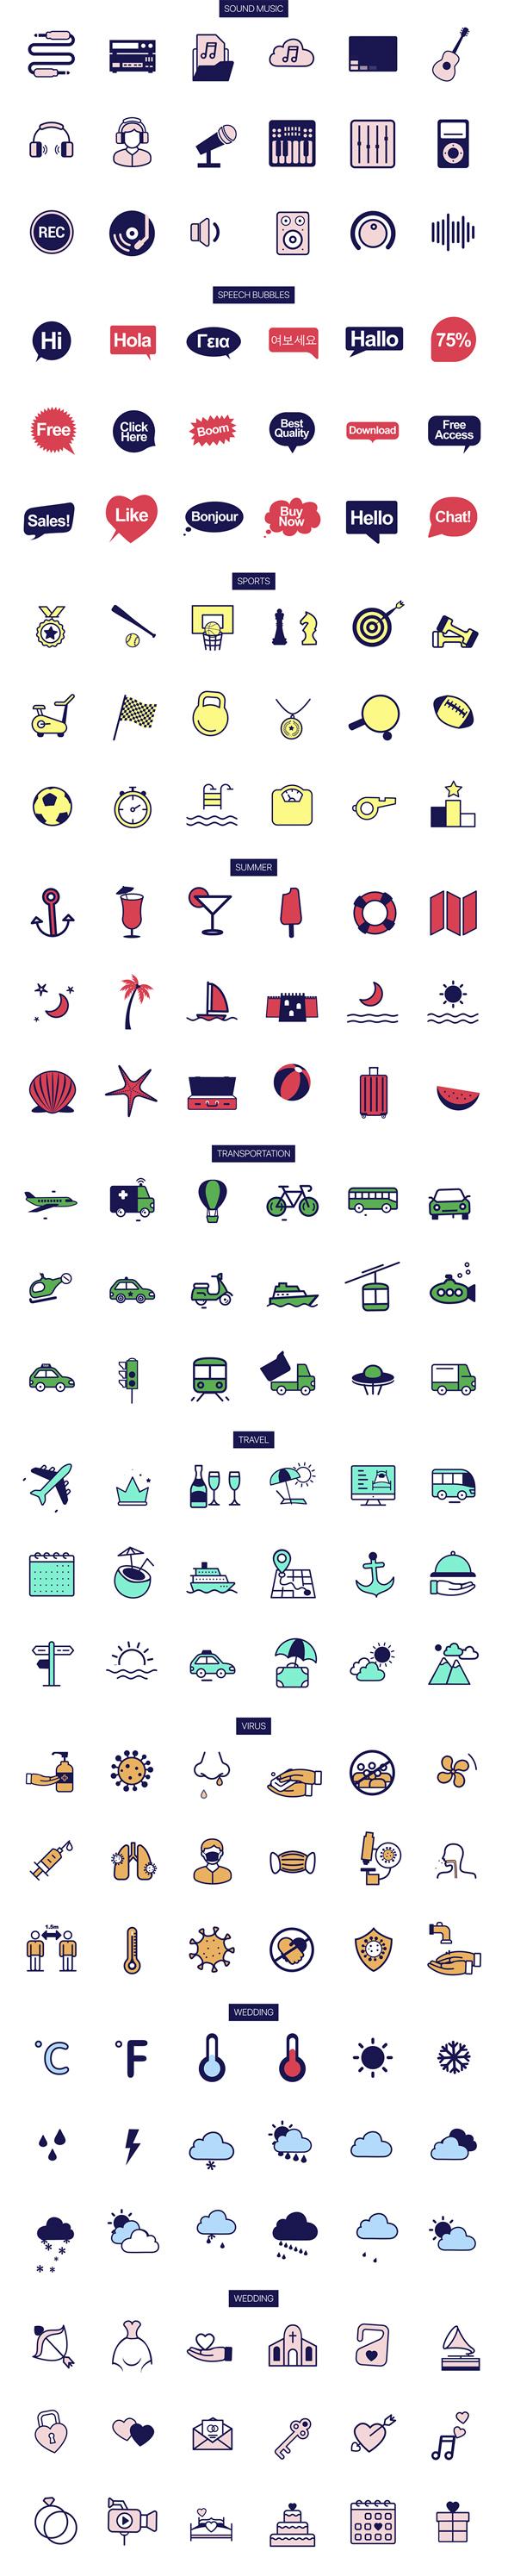 1000组线条ICON图标扁平化MG动画AE视频模板素材 PremiumBuilder Animated Icons插图12